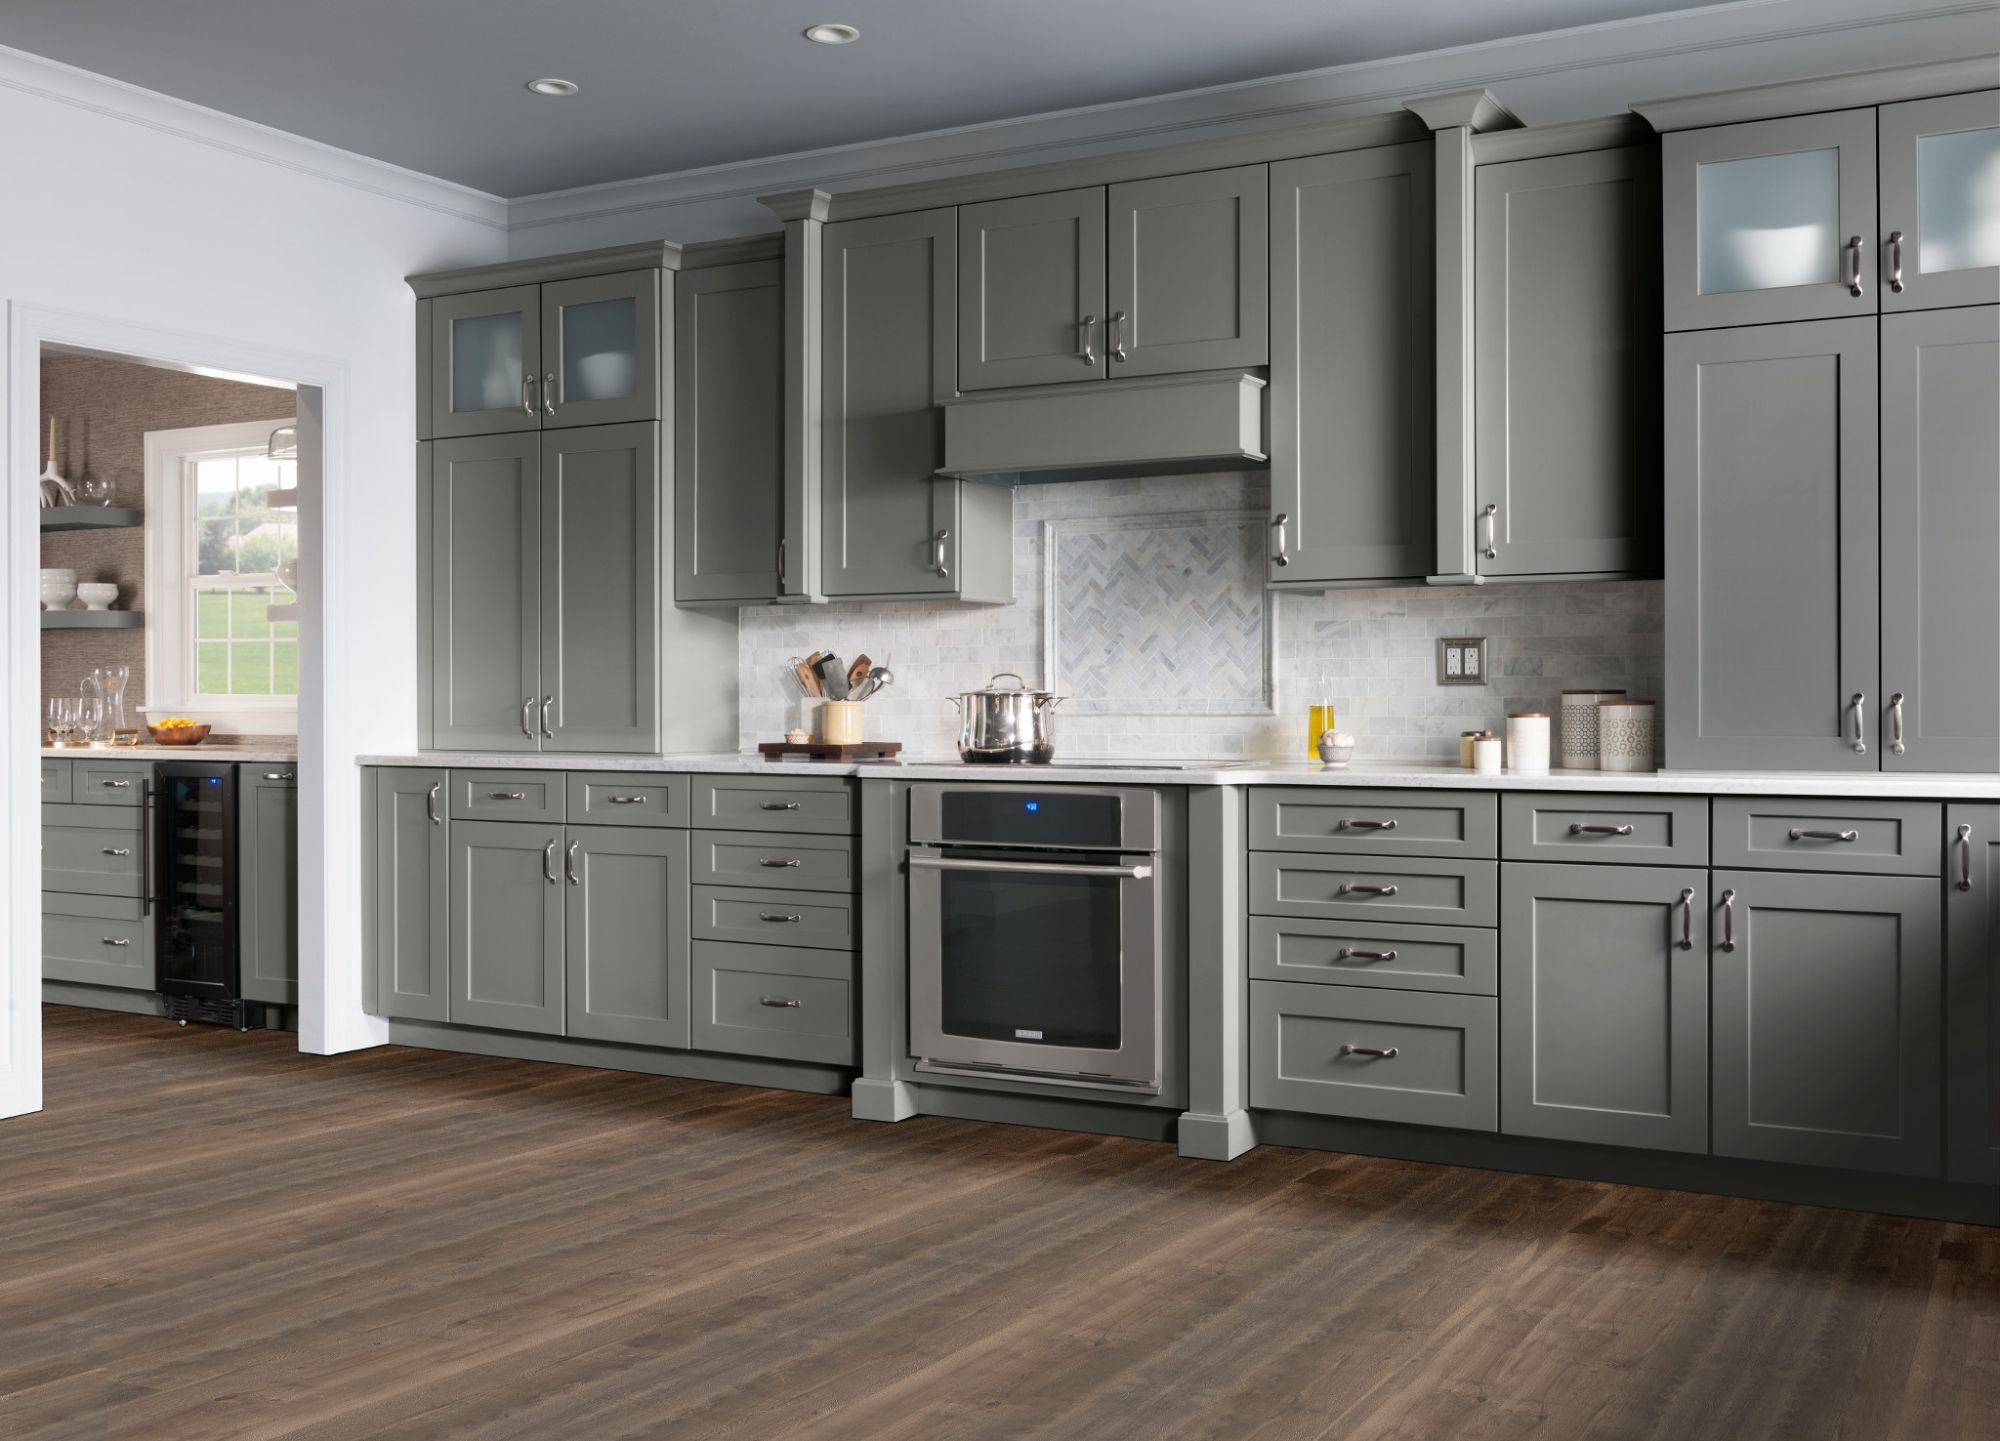 shenandoah cabinets mission shaker style kitchen cabinets kitchen cabinet styles kitchen on kitchen id=57110